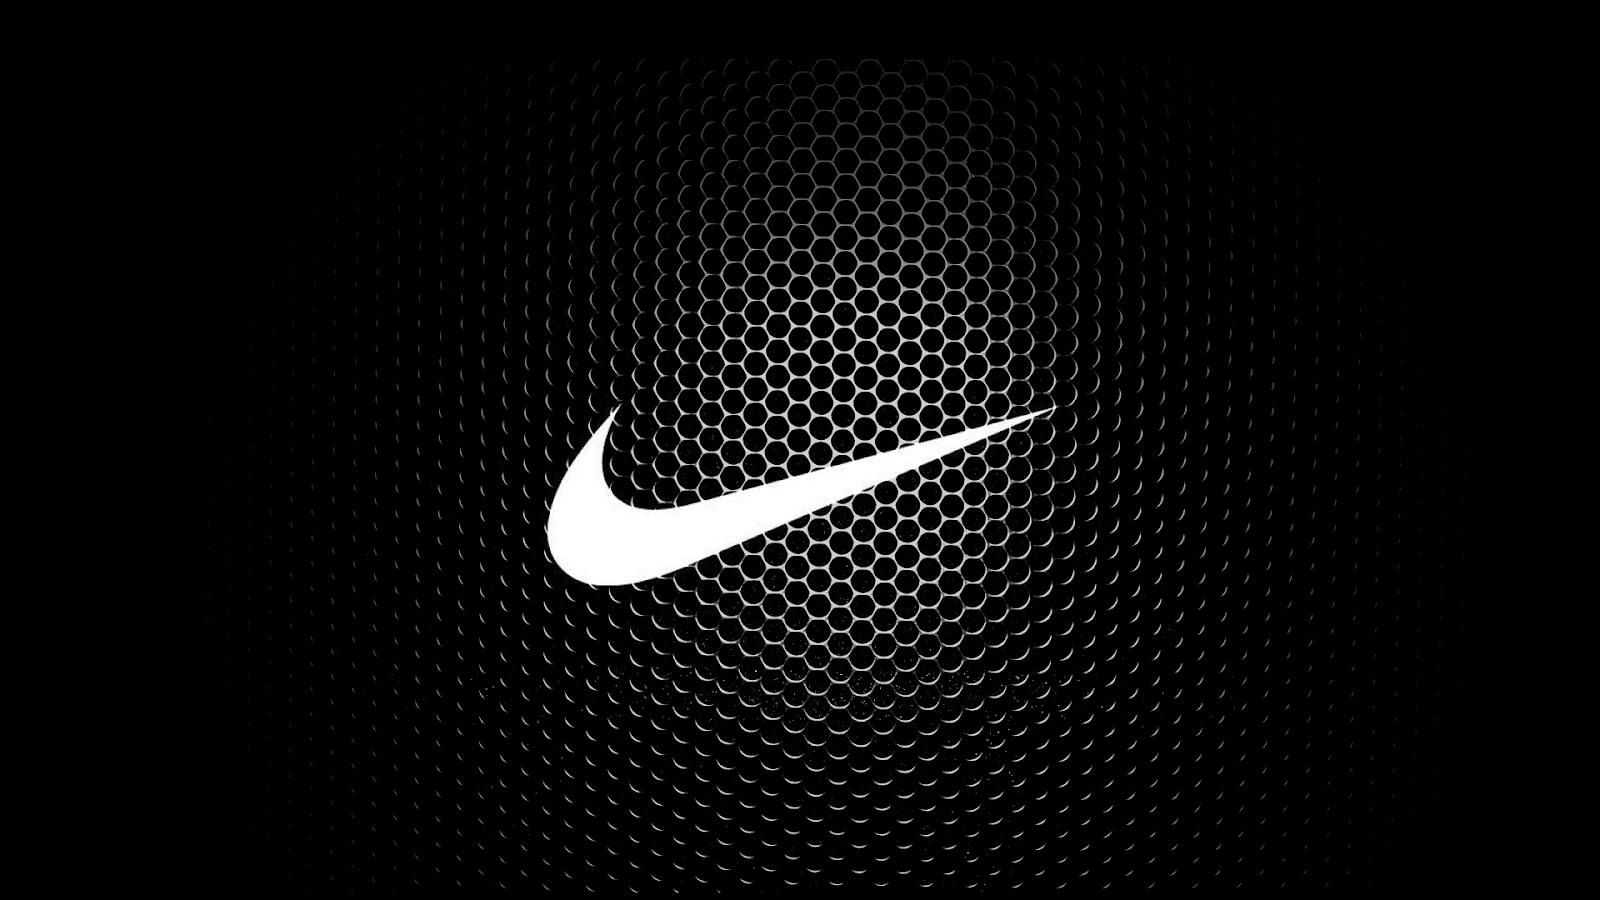 Nike Wallpaper HD HD Wallpaper of Sports   hdwallpaper2013com 1600x900